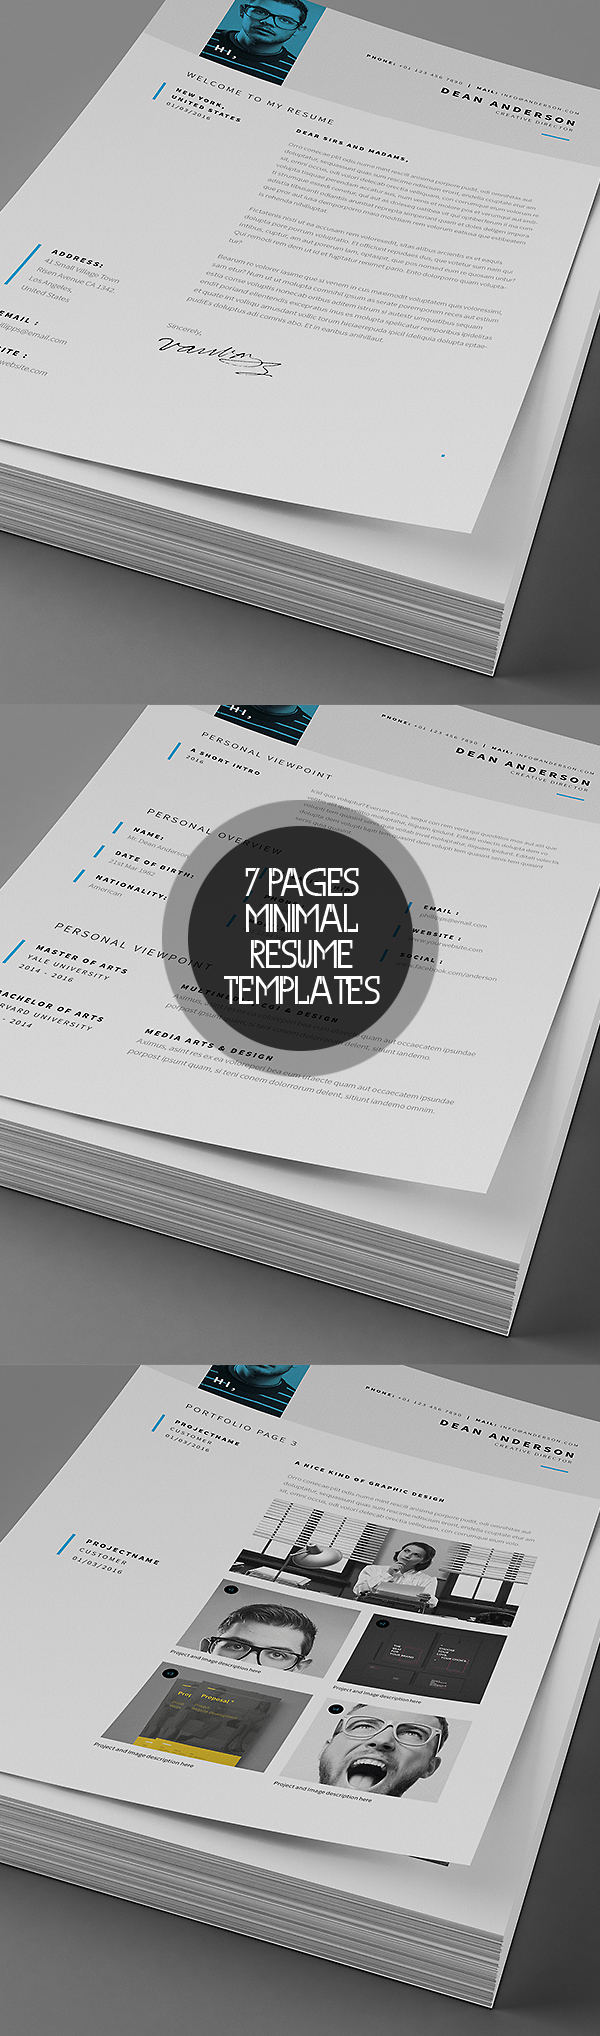 50 Best Minimal Resume Templates - 8